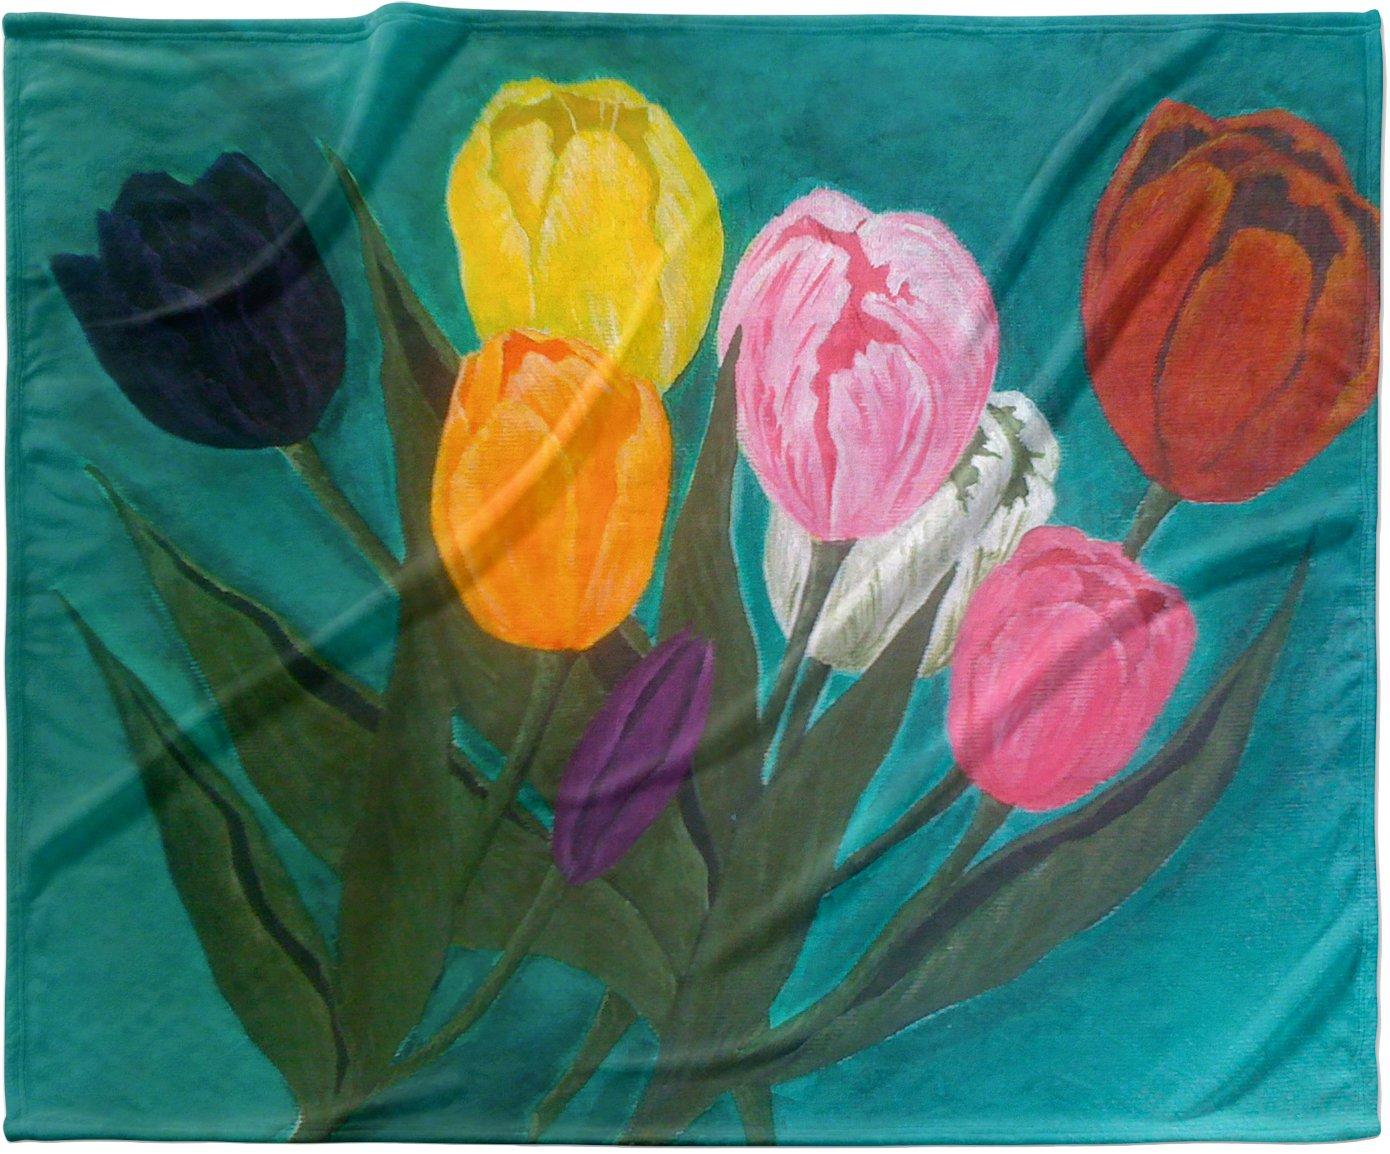 KESS InHouse Christen Treat 'Tulips' Rainbow Flower Fleece Baby Blanket, 40' x 30'